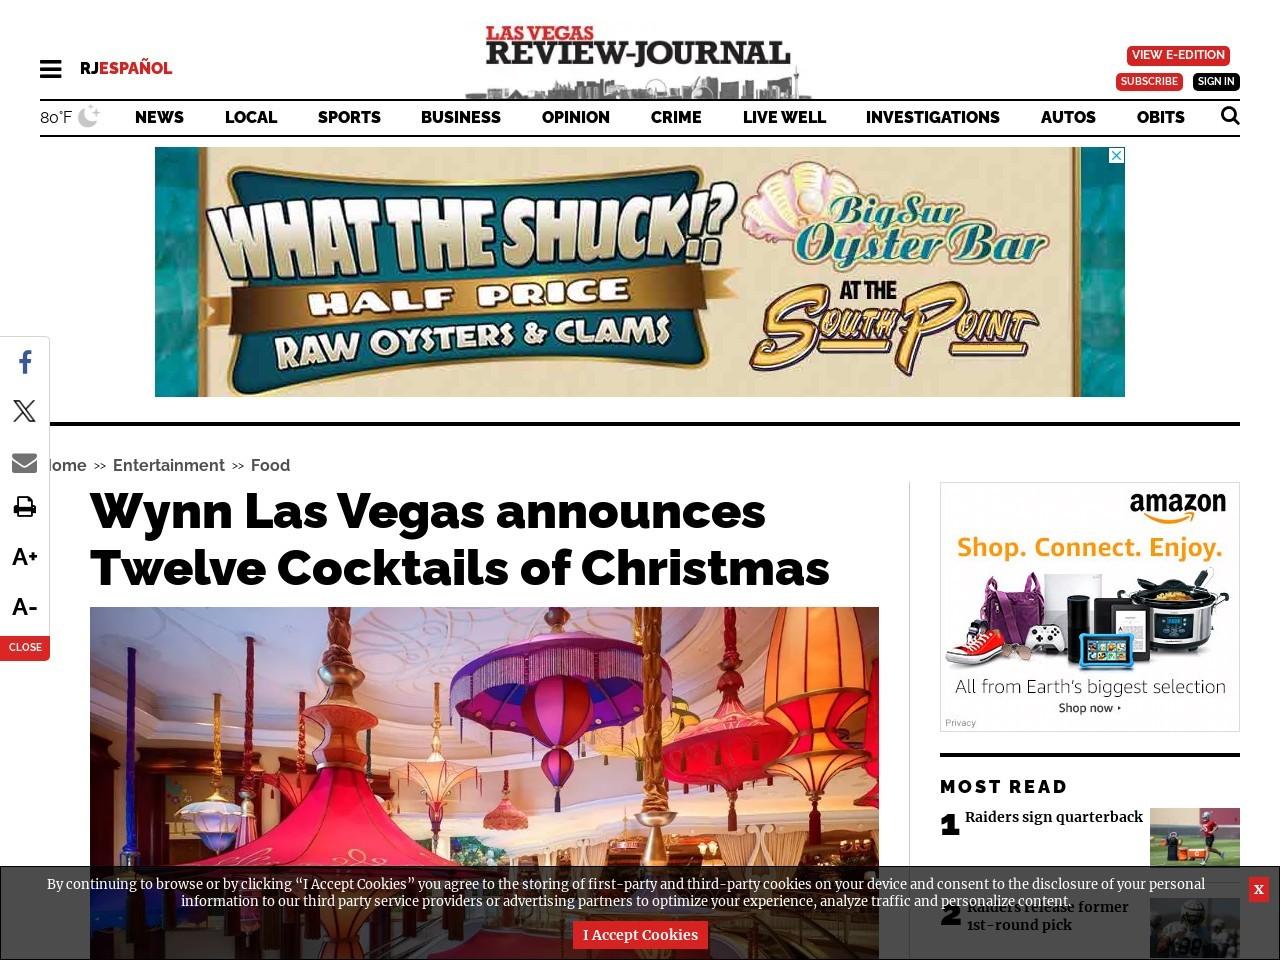 Wynn Las Vegas announces Twelve Cocktails of Christmas